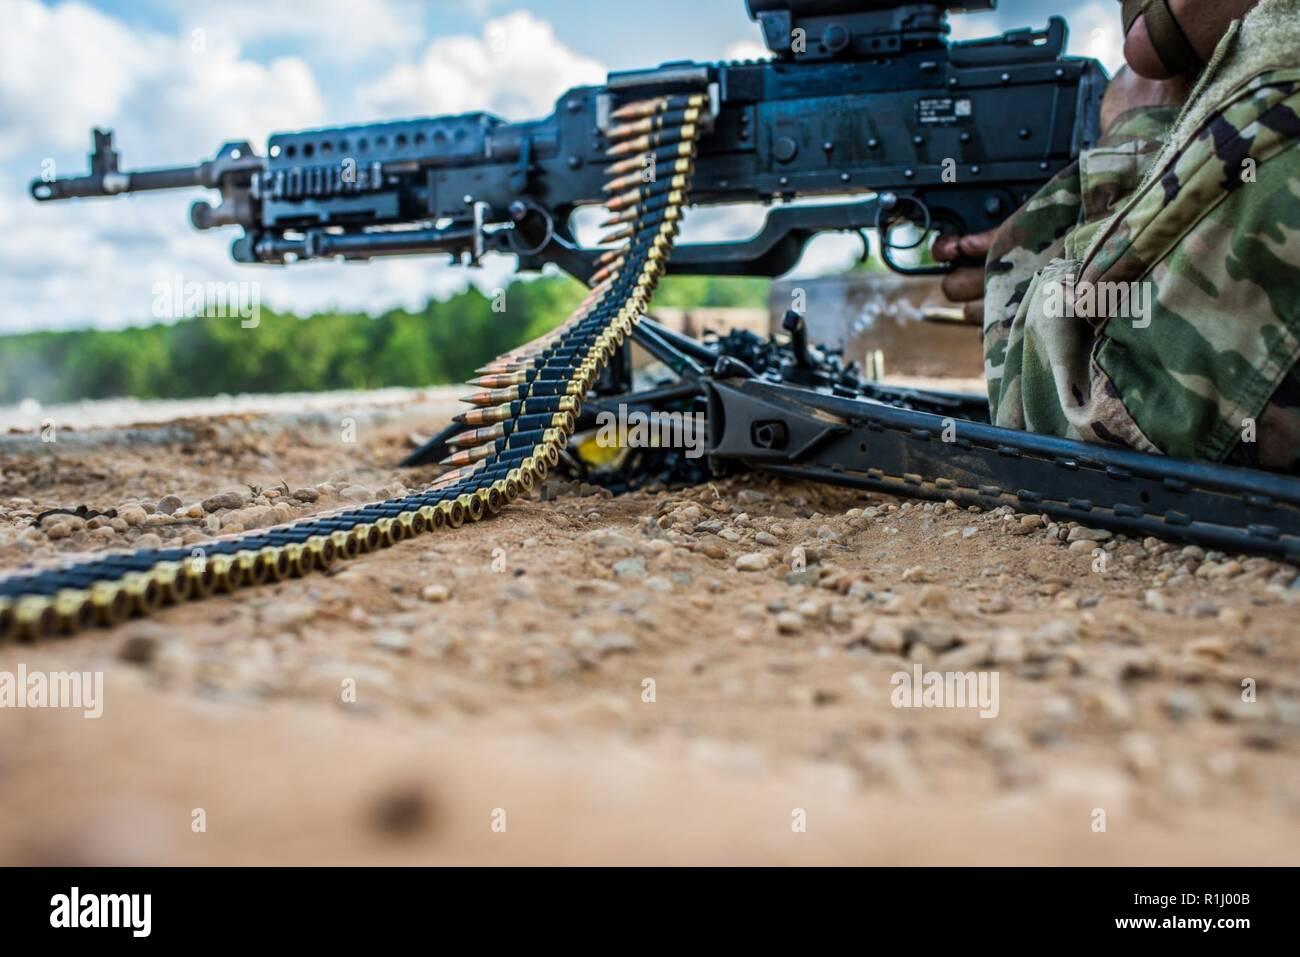 Machine Gun Instruction Stock Photos & Machine Gun